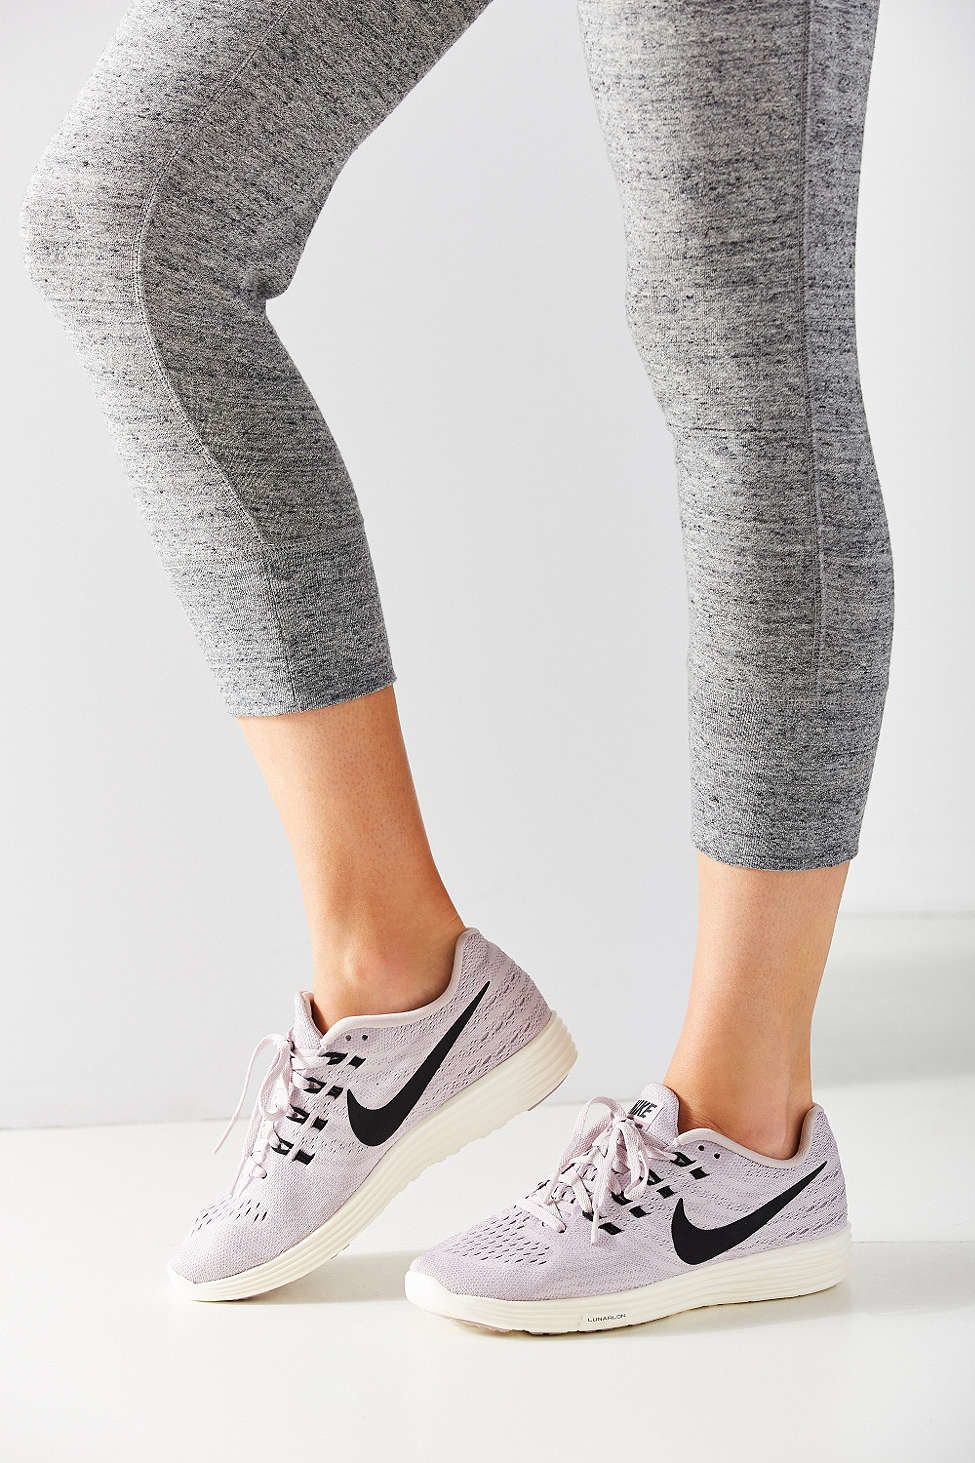 finest selection dba53 e7e74 Nike Lunartempo 2 Sneaker in Pink - Lyst